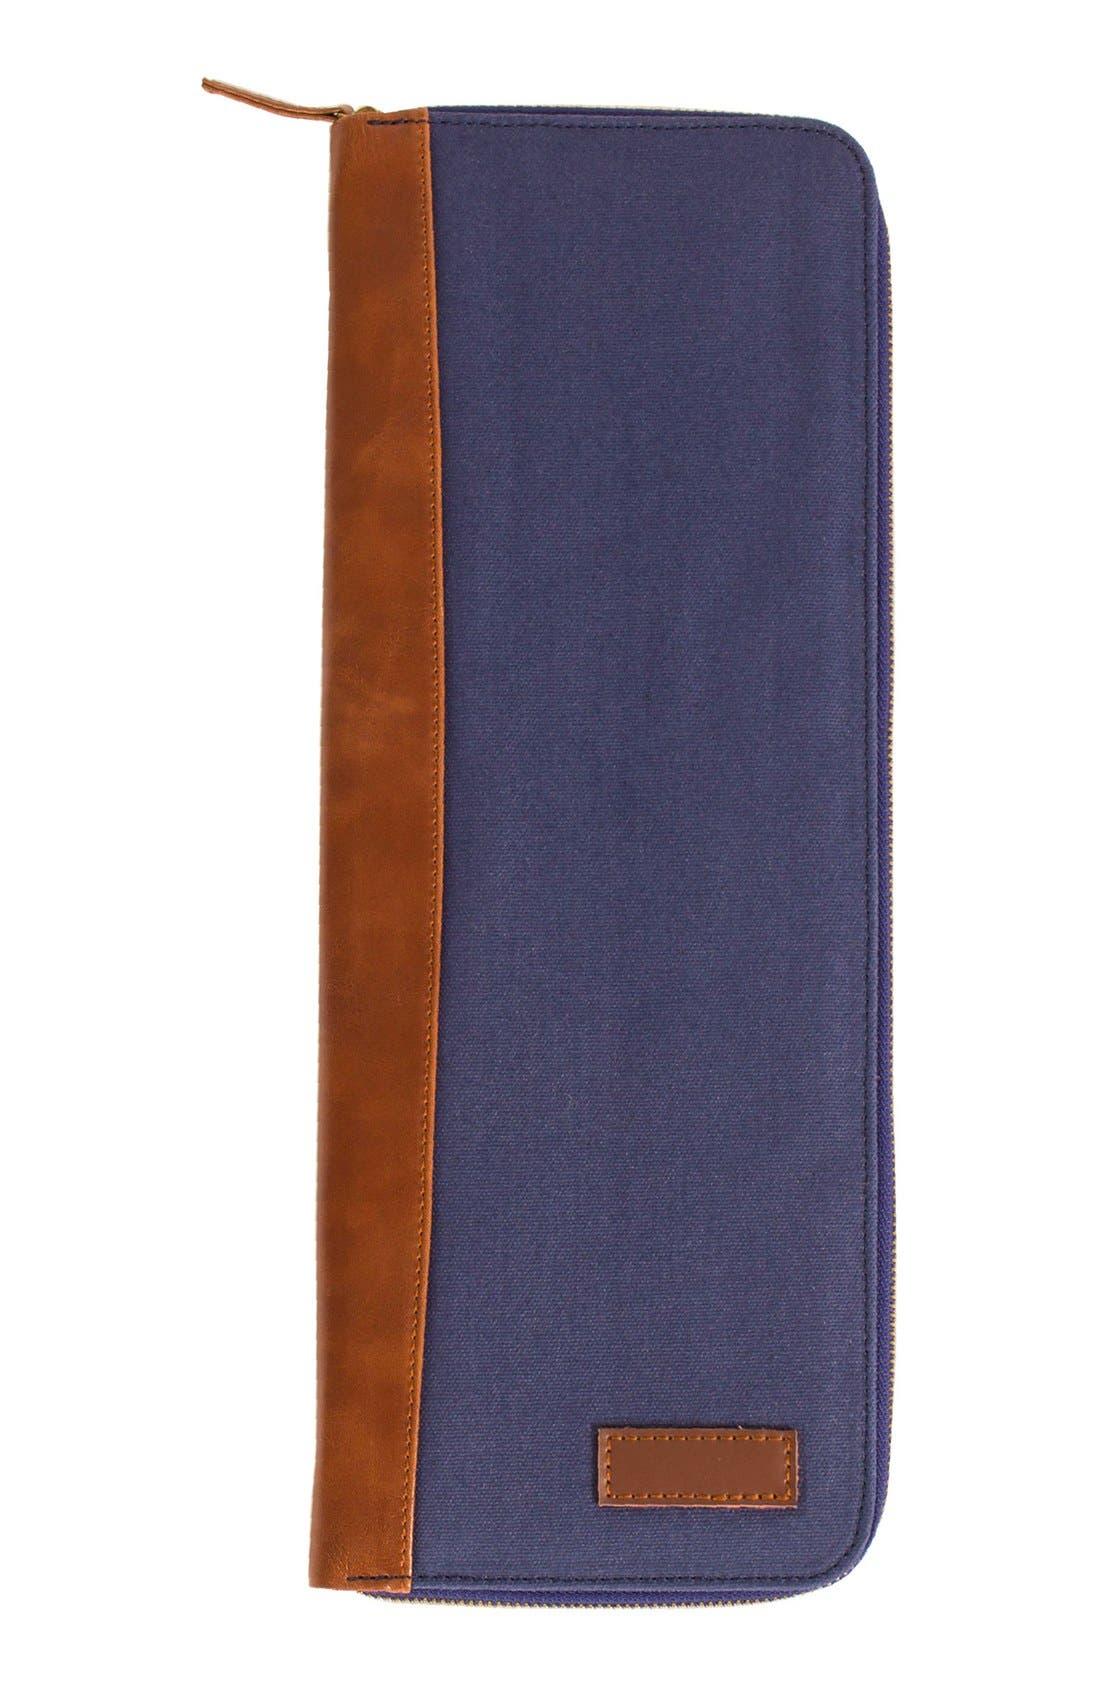 Monogram Tie Case,                             Main thumbnail 1, color,                             NAVY